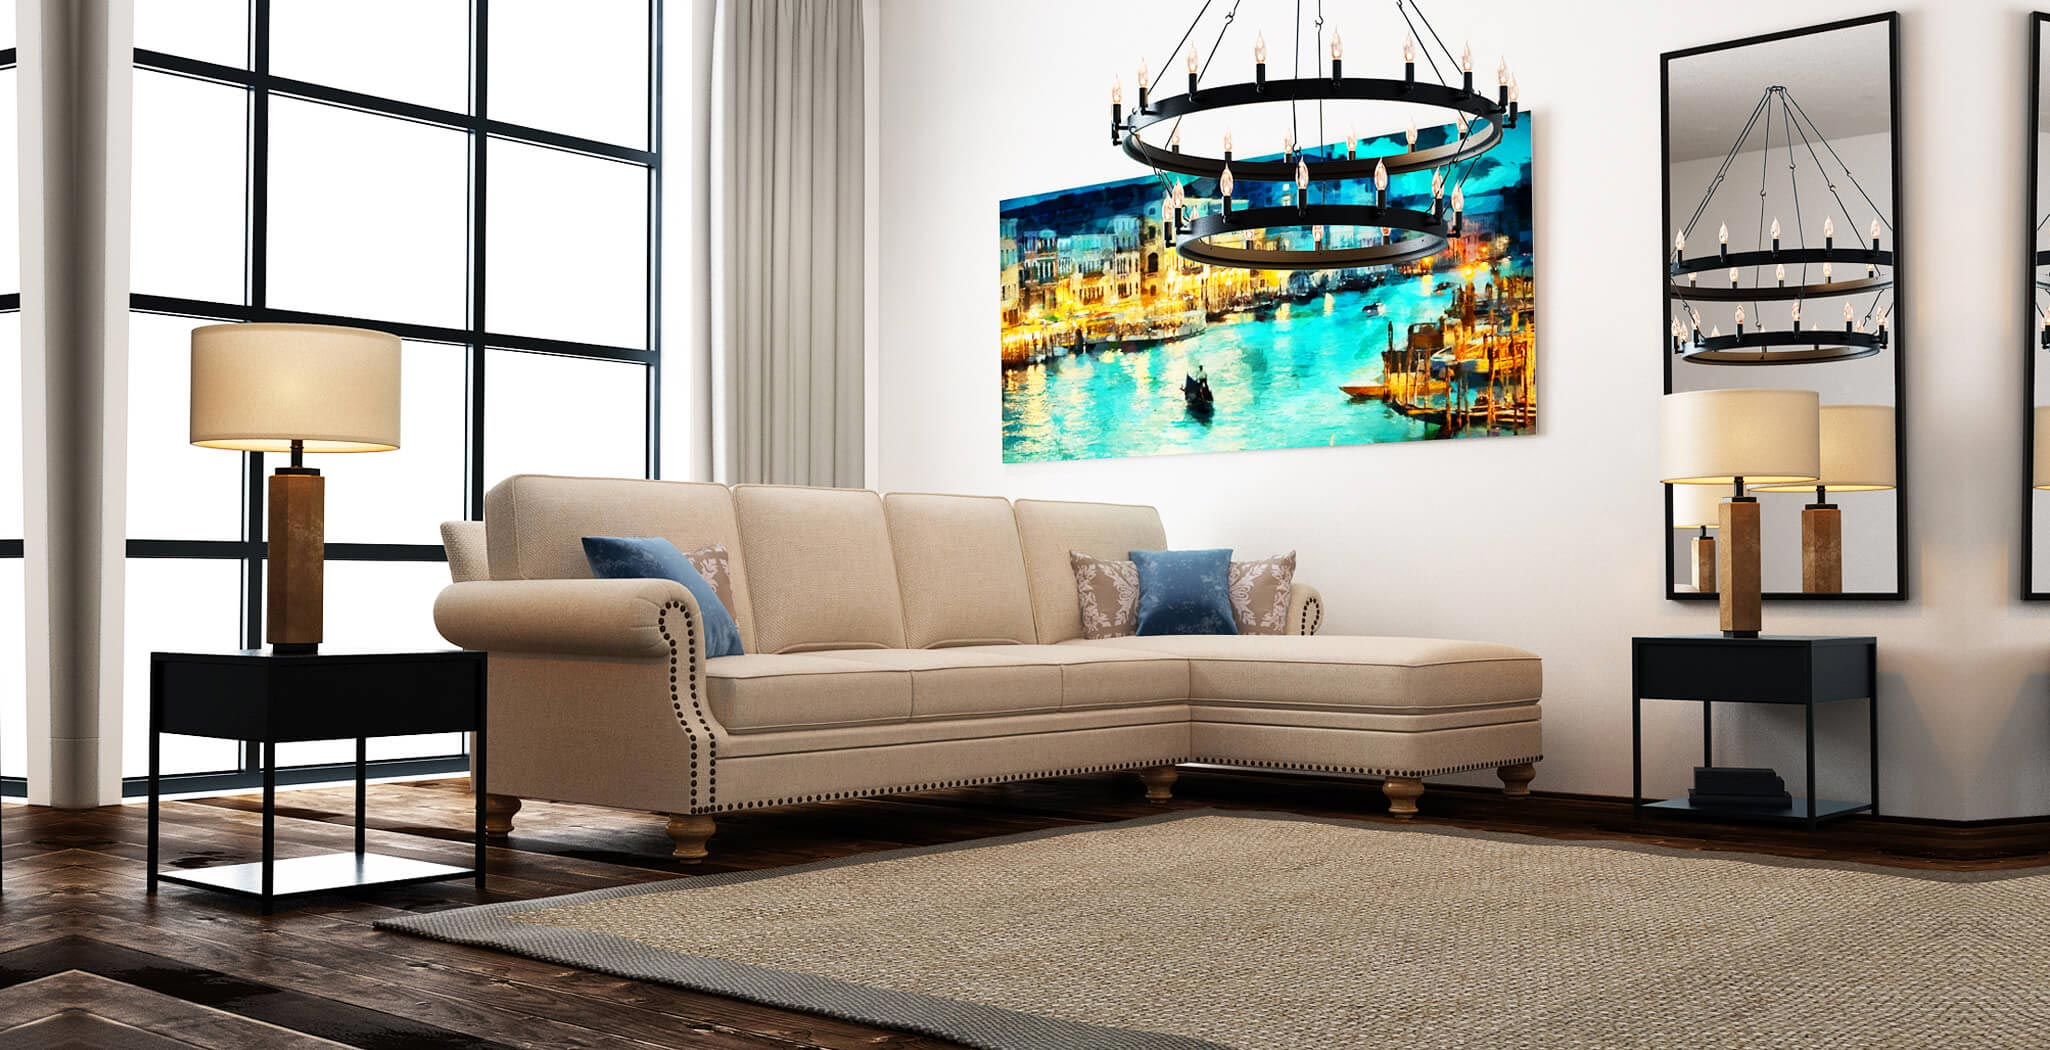 rotterdam panel furniture gallery 1